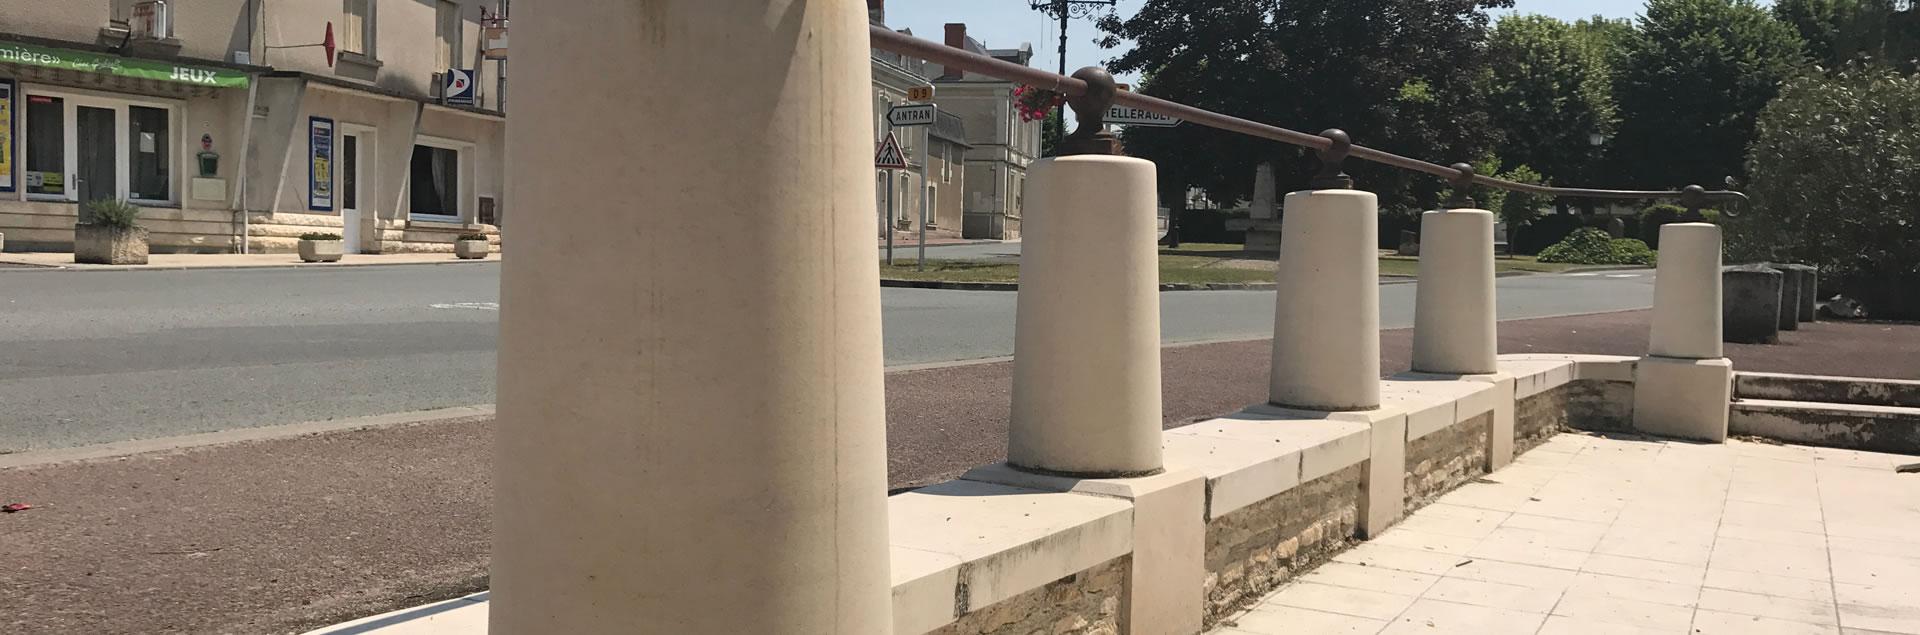 Maquignon - La pierre de Haims